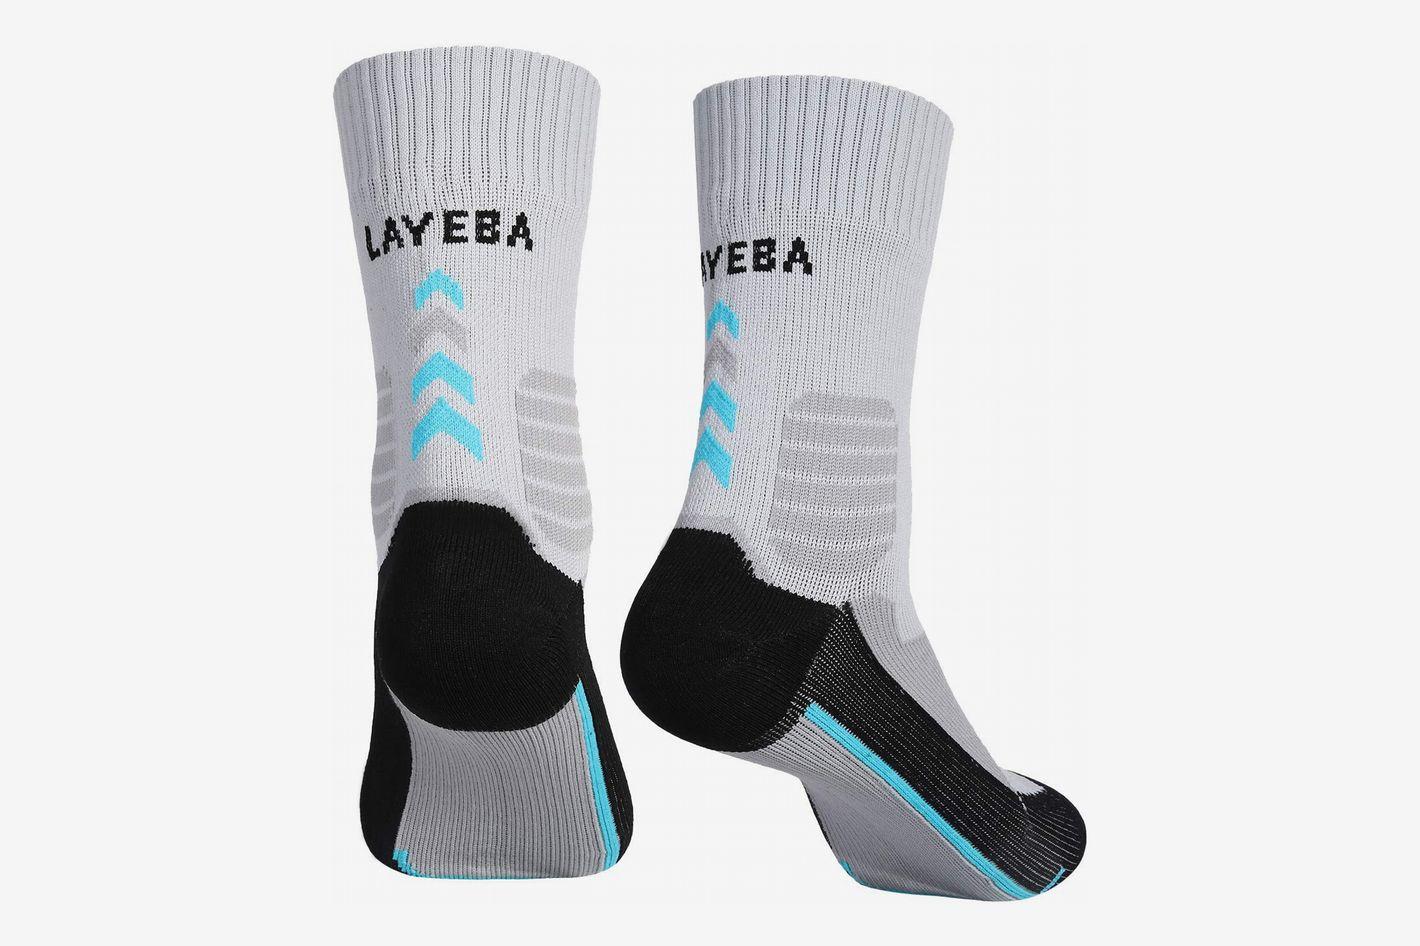 Layeba 100% Waterproof Breathable Socks